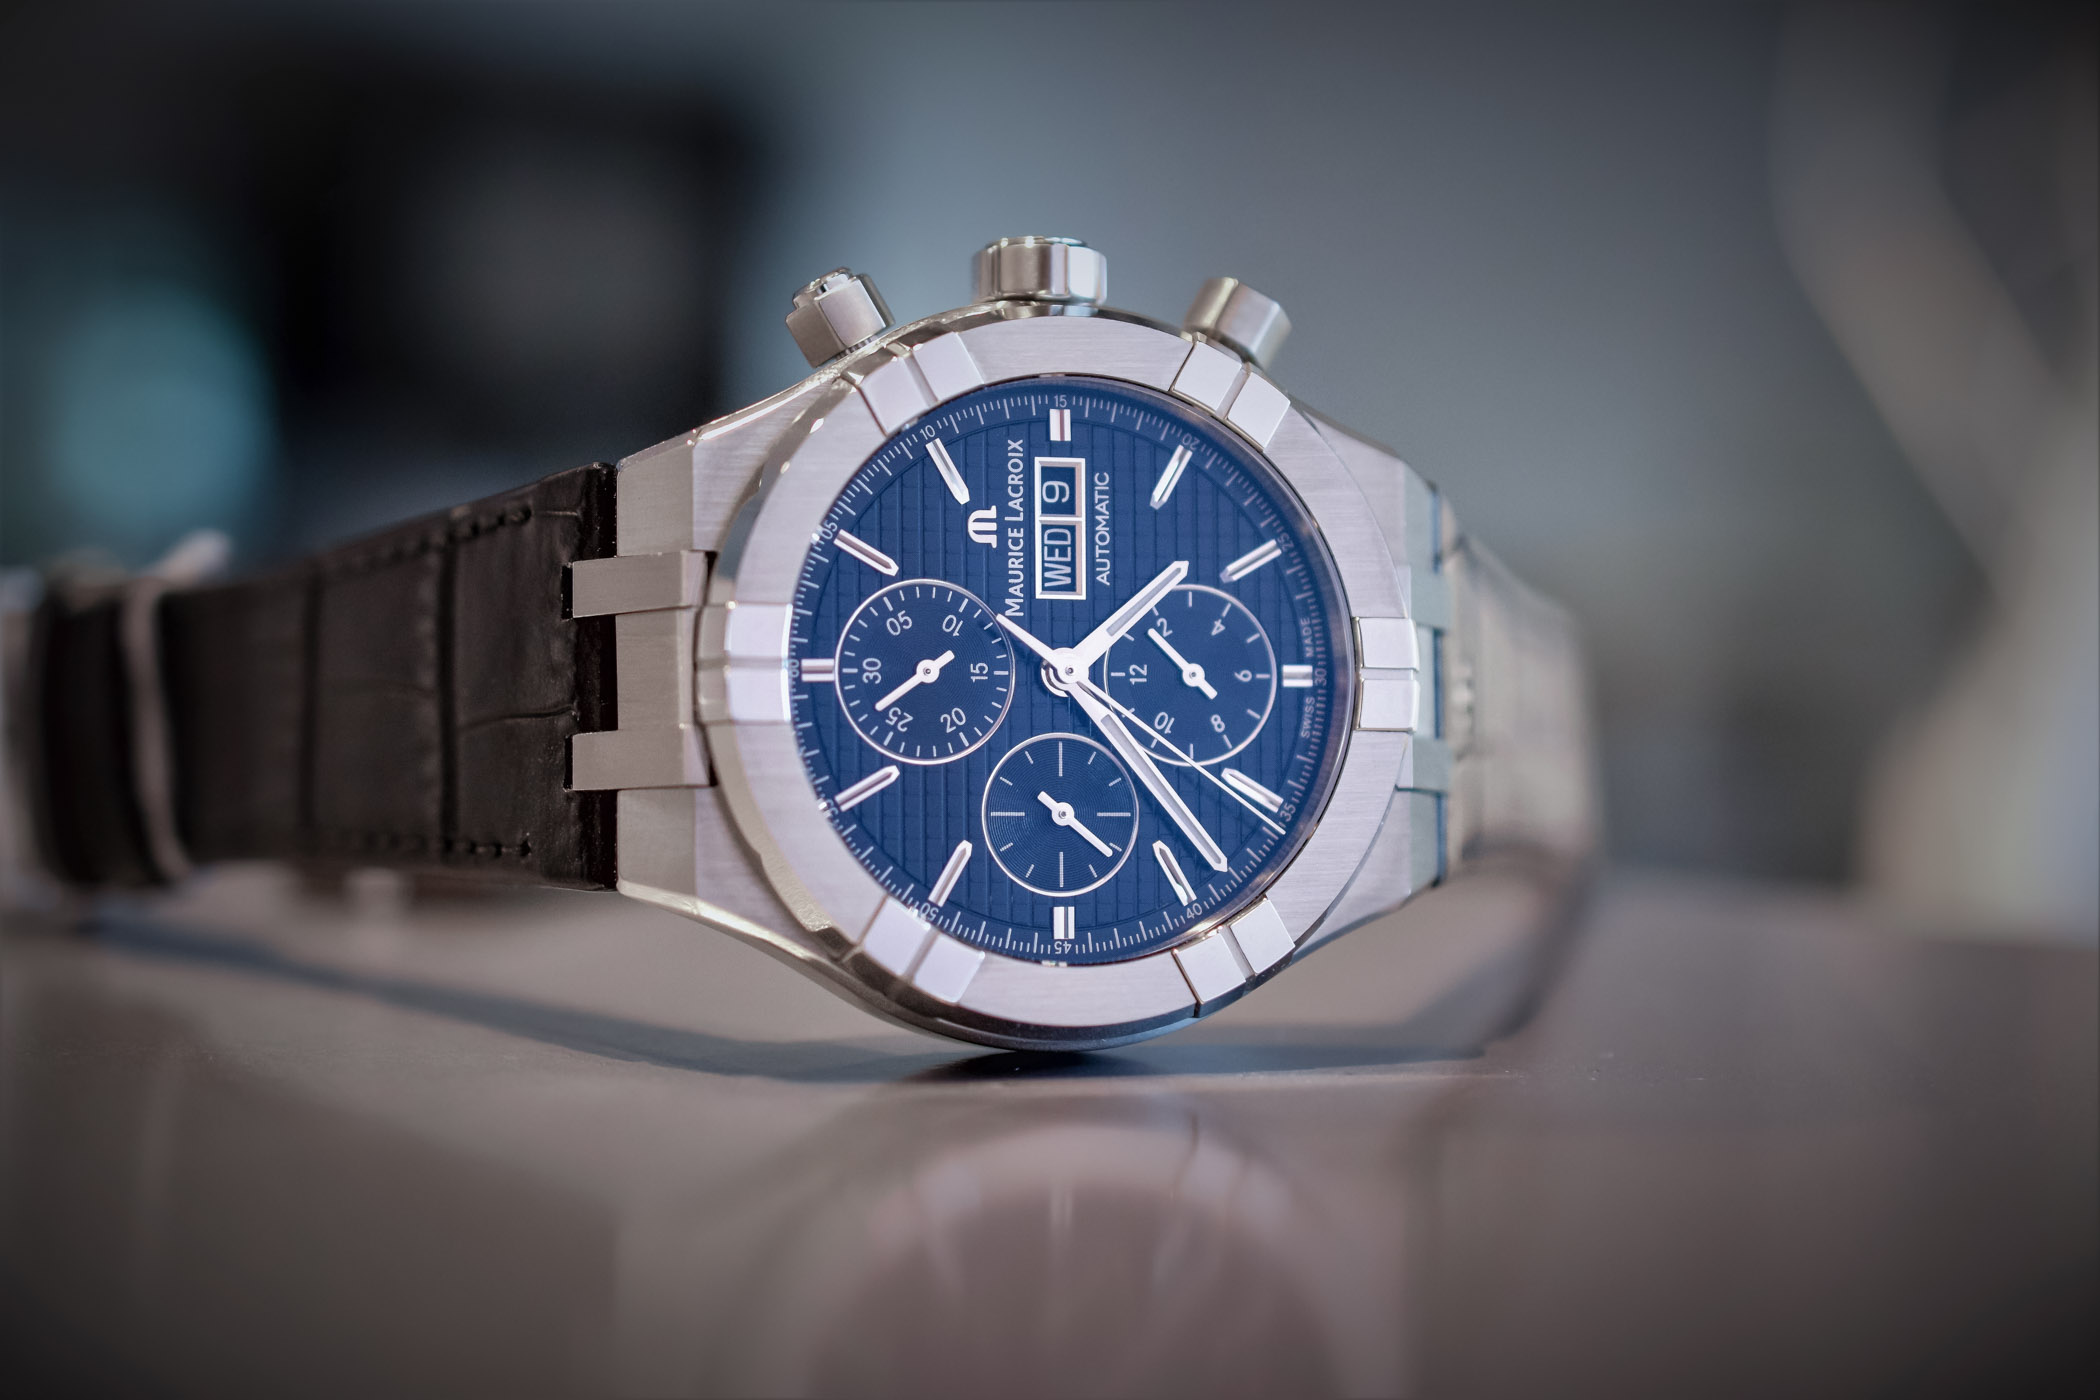 Maurice Lacroix Aikon Automatic chronograph - Baselworld 2018